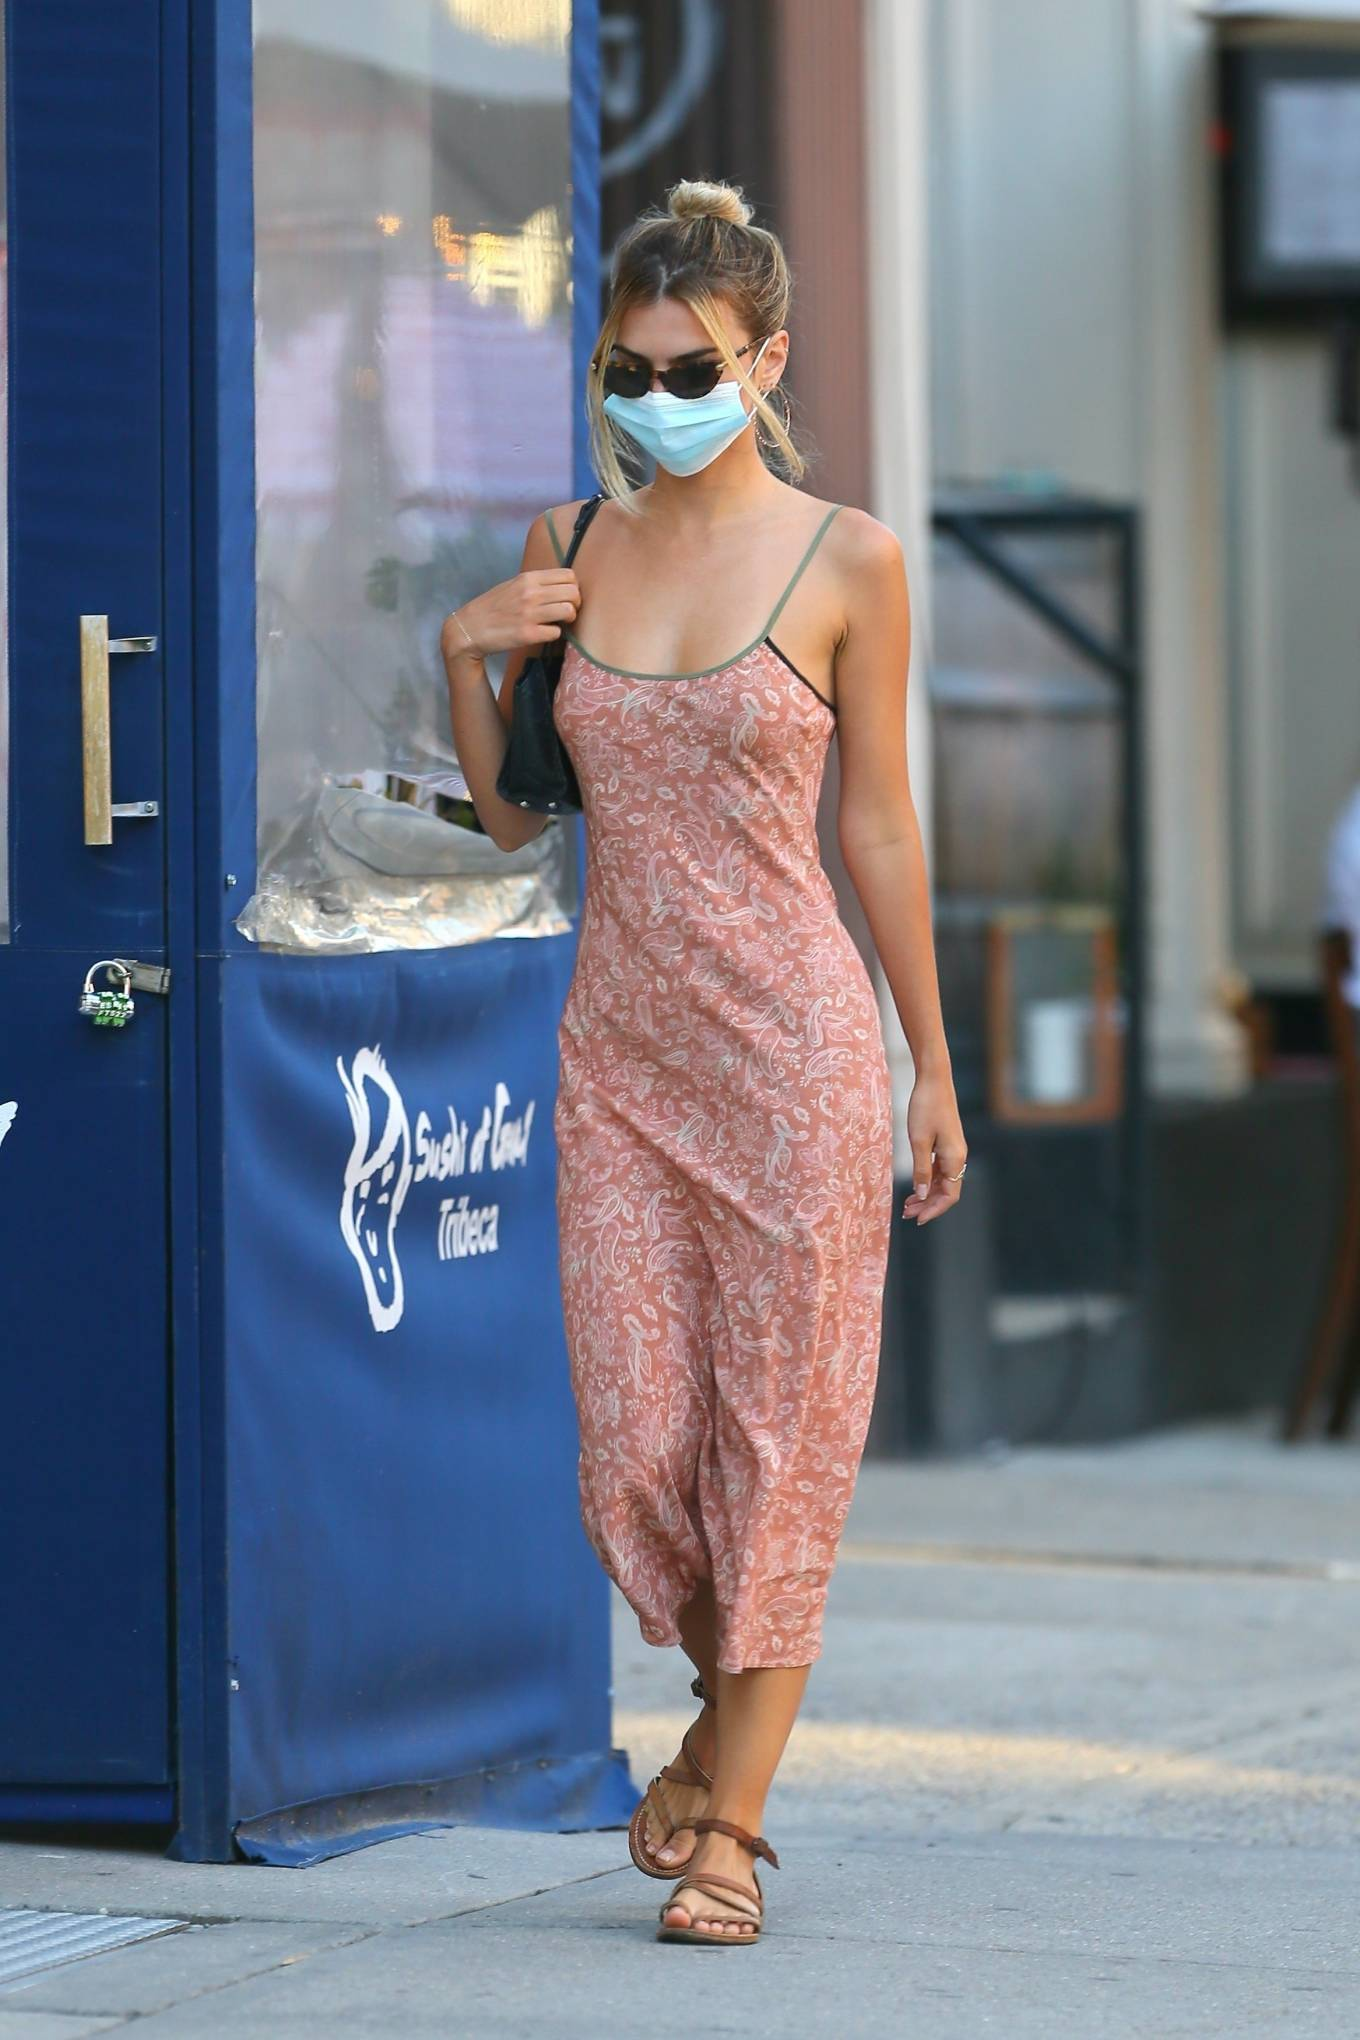 Emily Ratajkowski - In maxi dress while out in New York